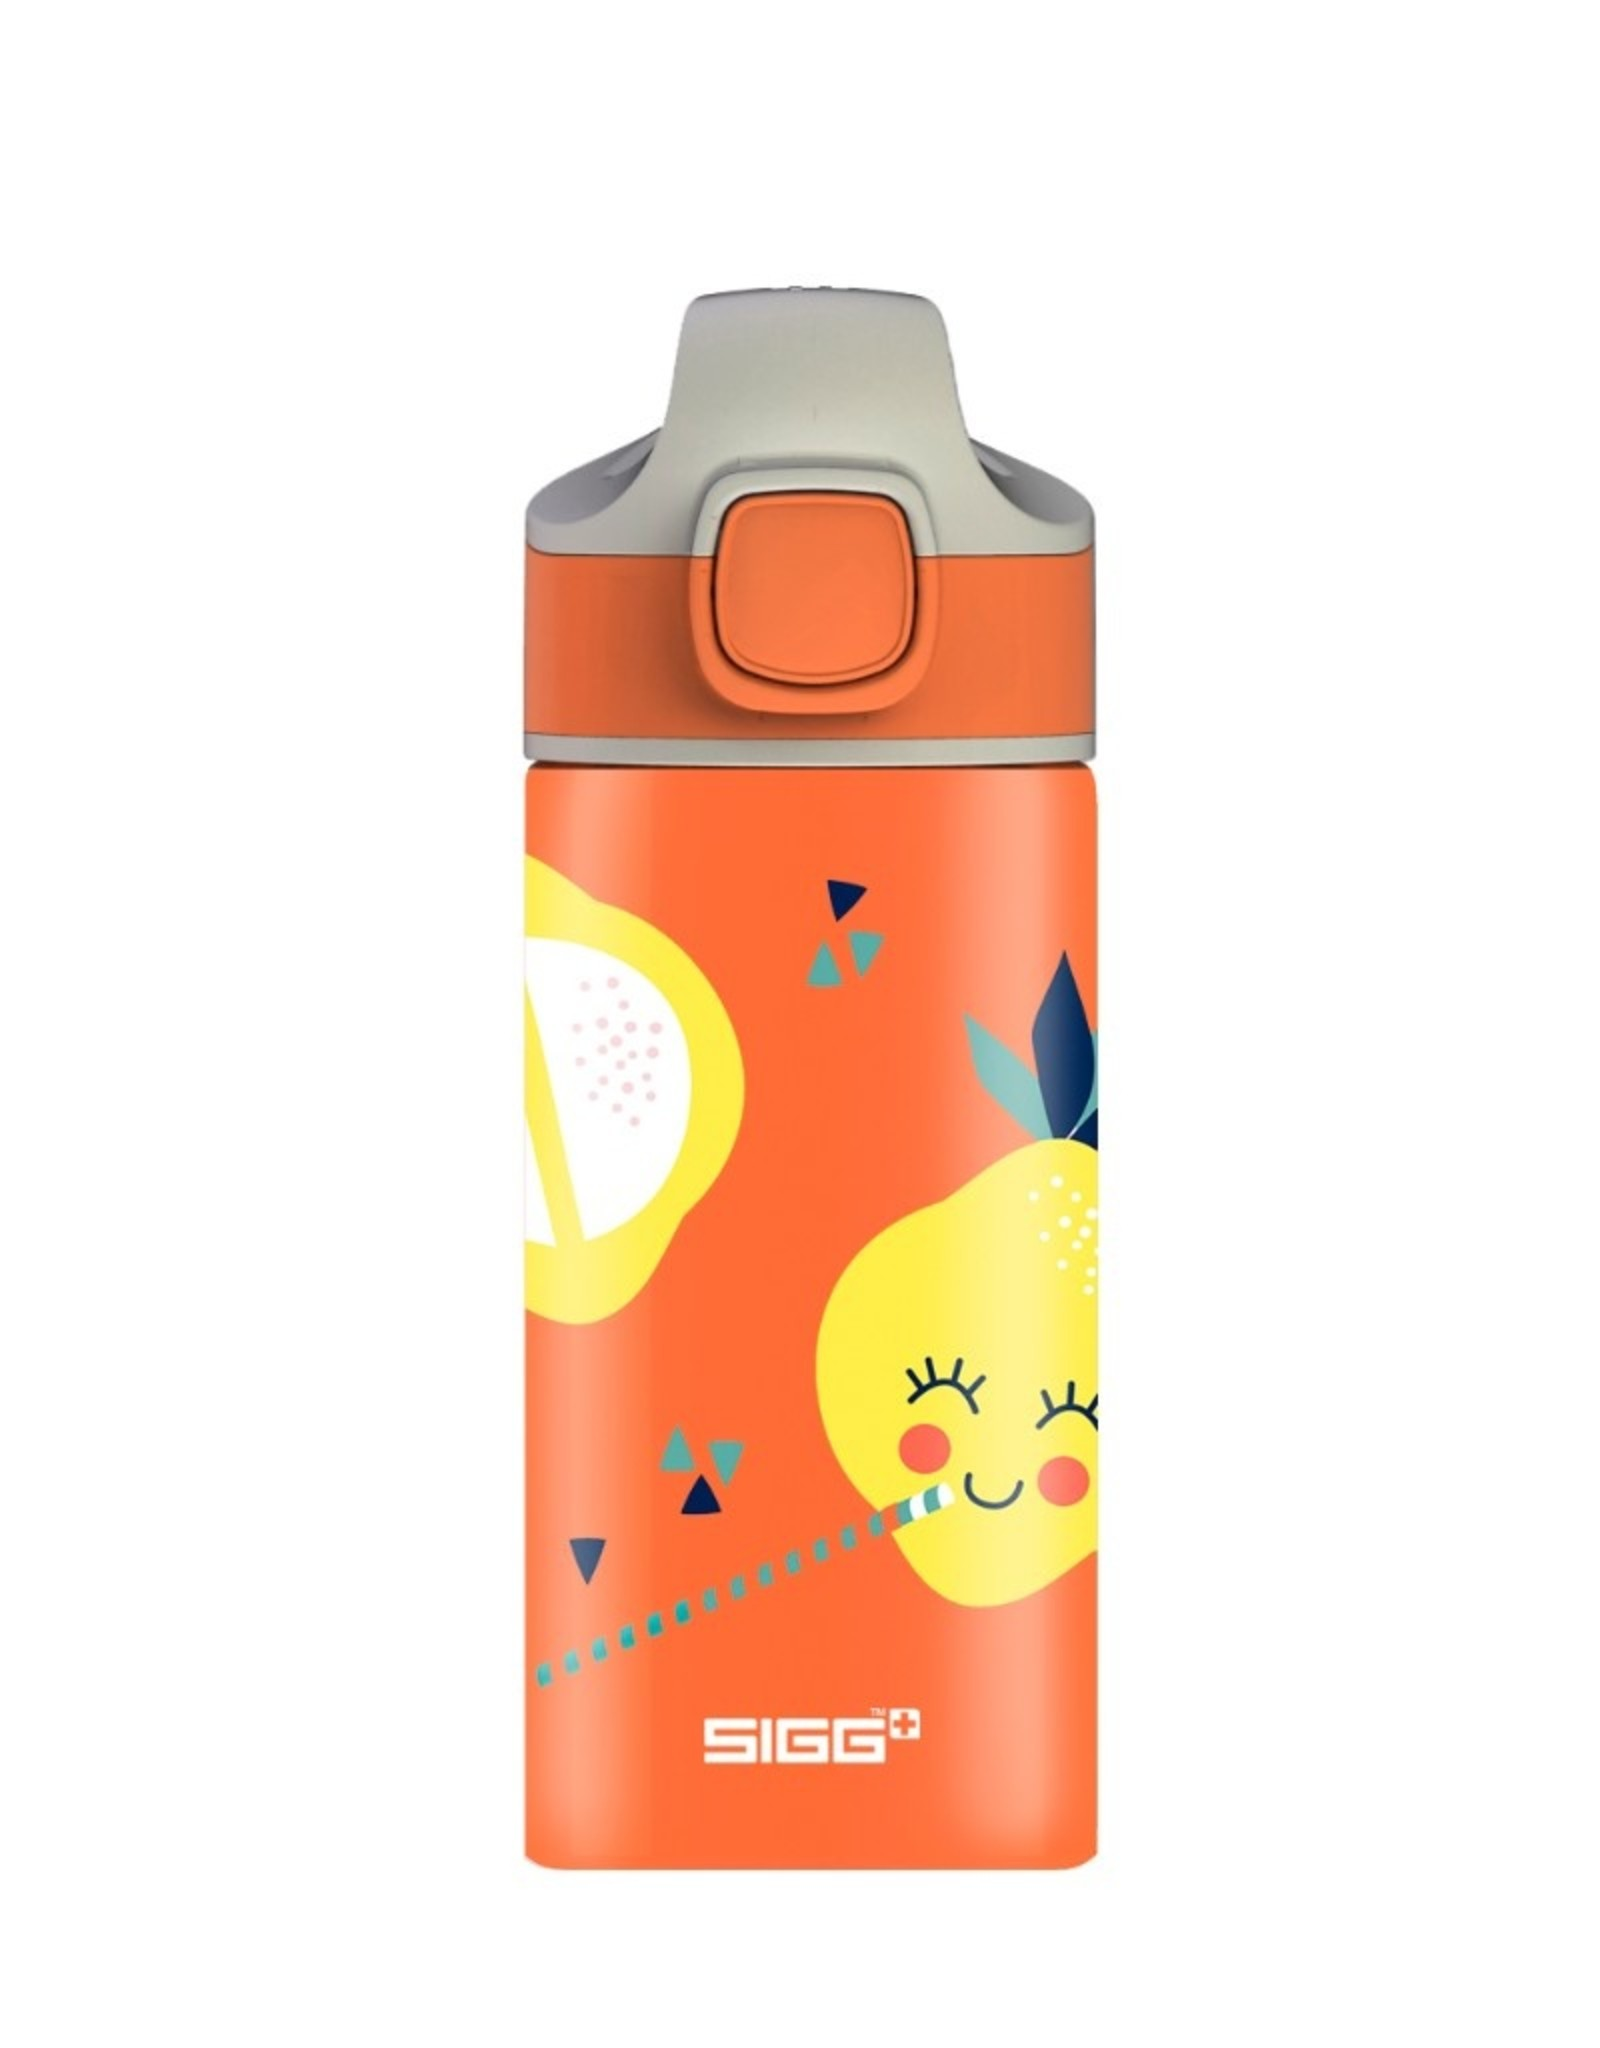 Sigg DRINKFLES - CITROEN - 0,4L